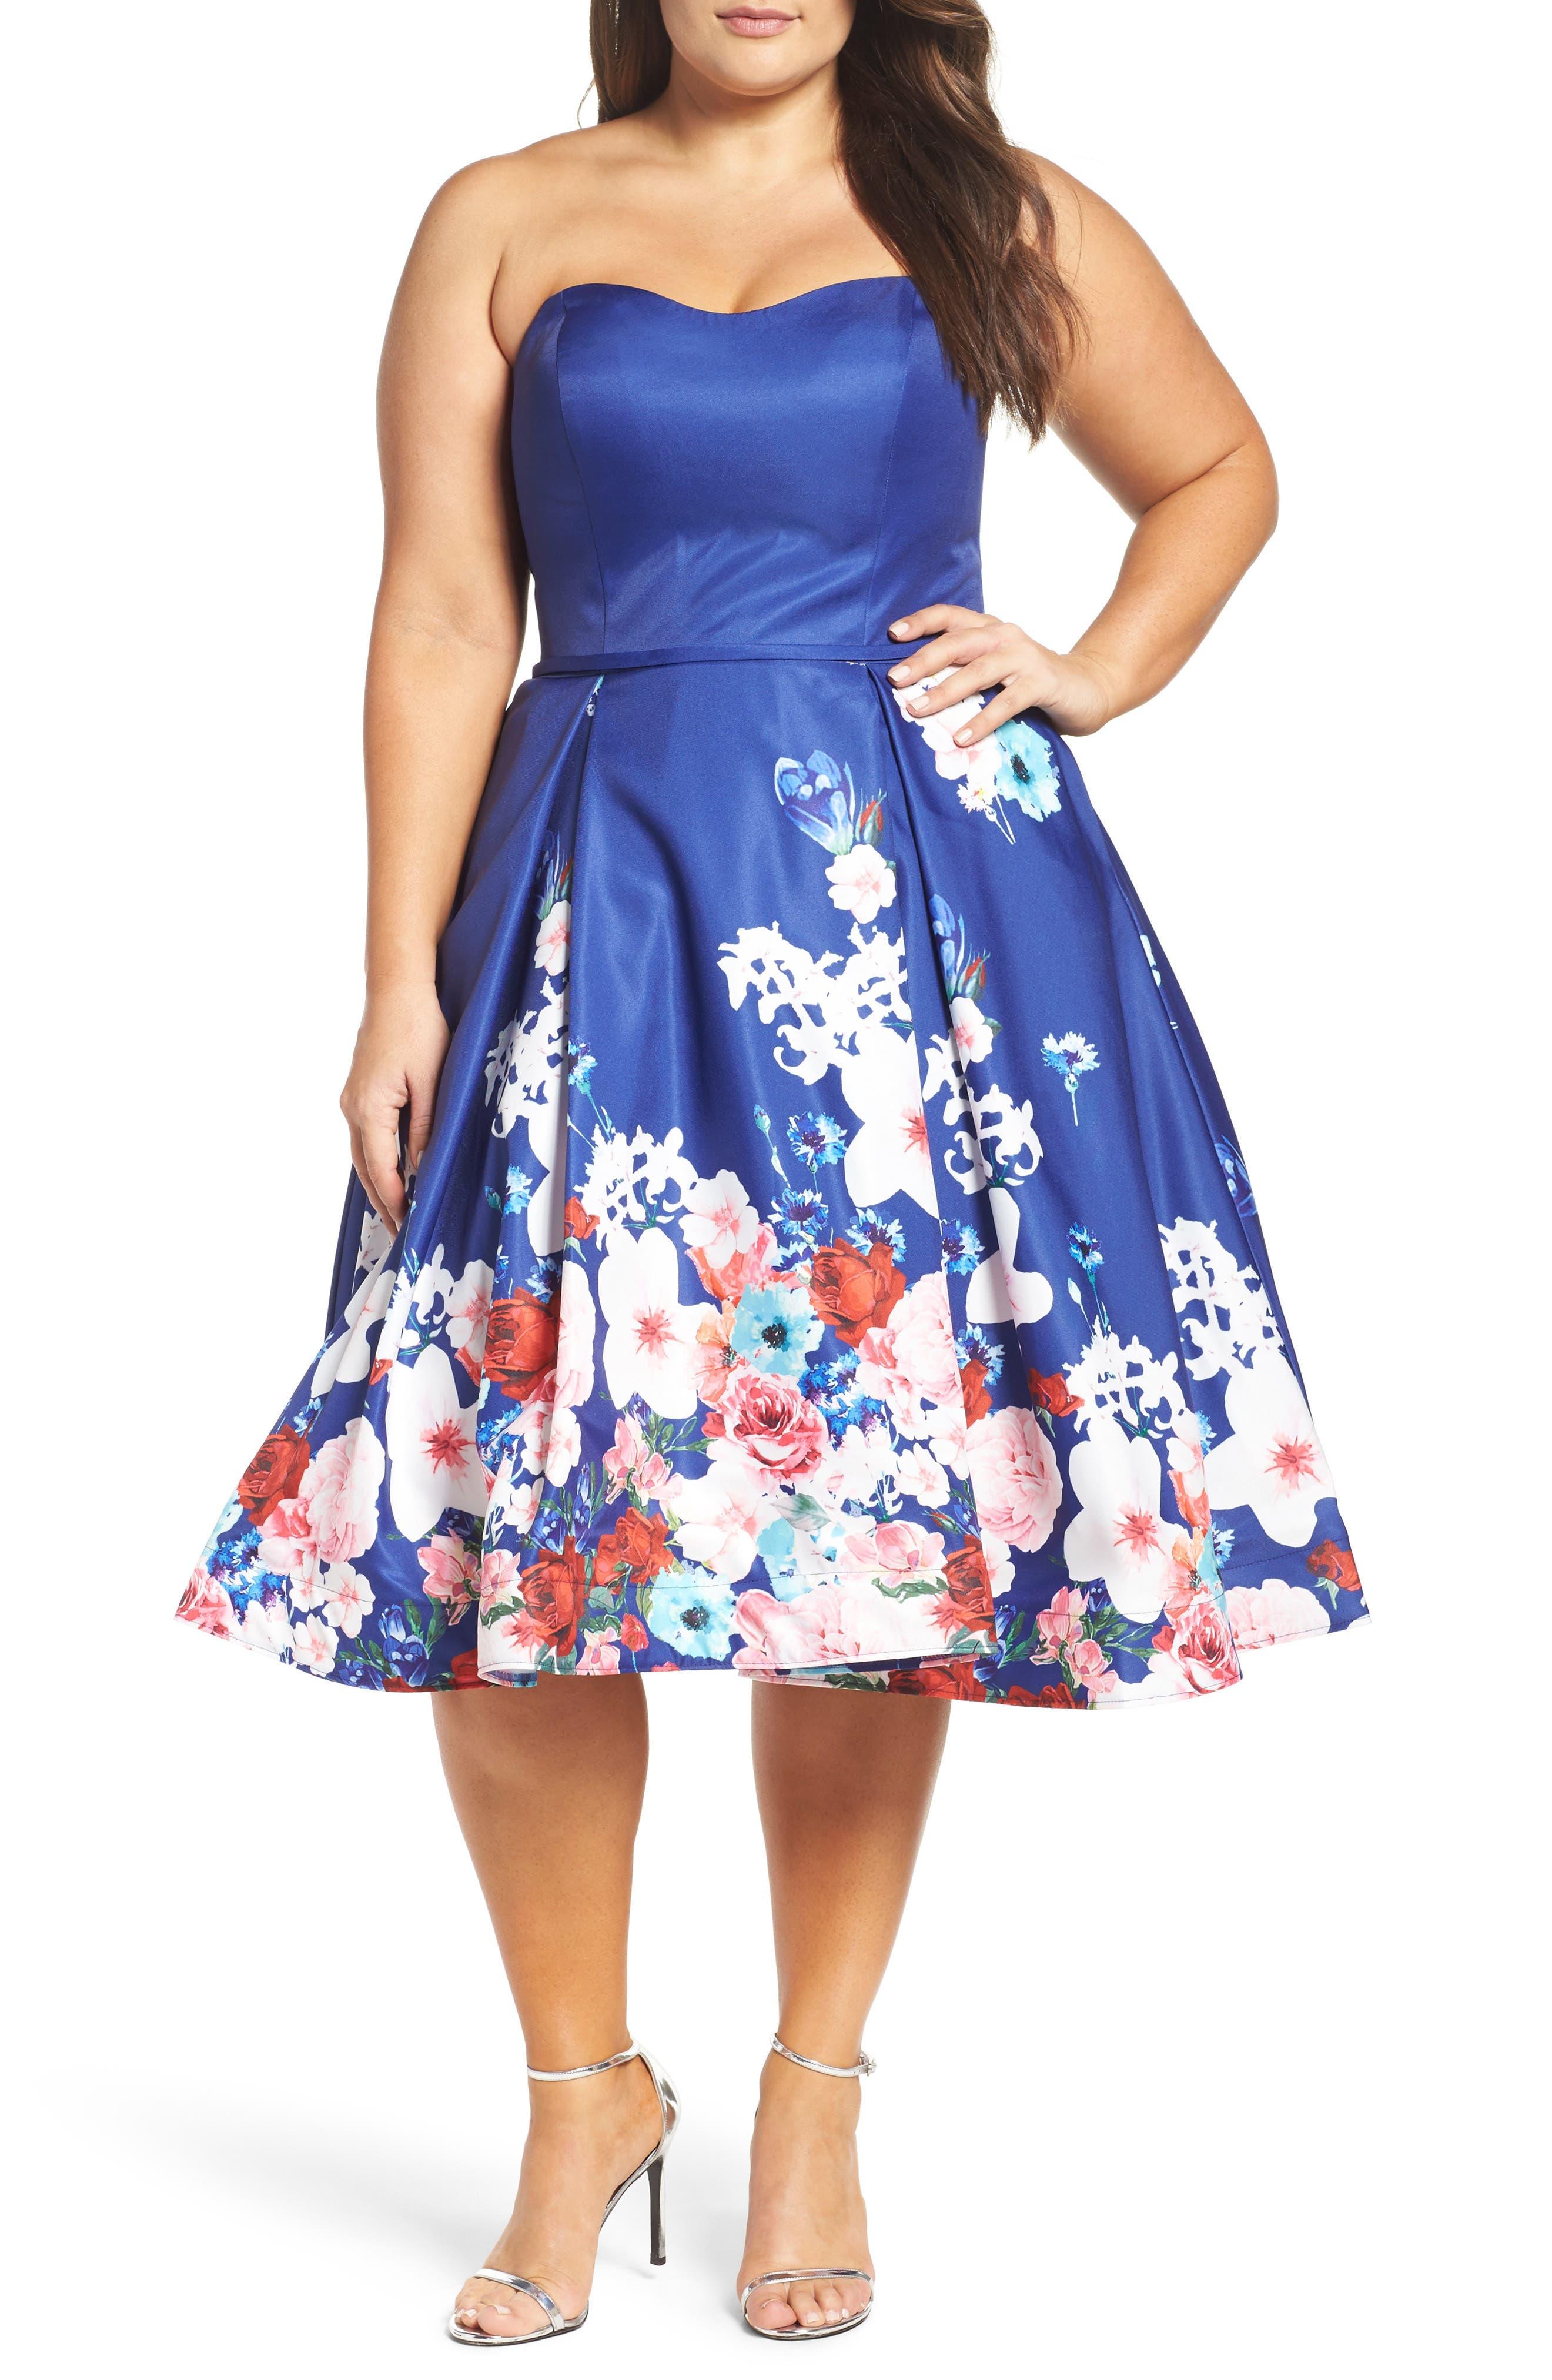 Floral Strapless Cocktail Dress,                         Main,                         color, FLORAL